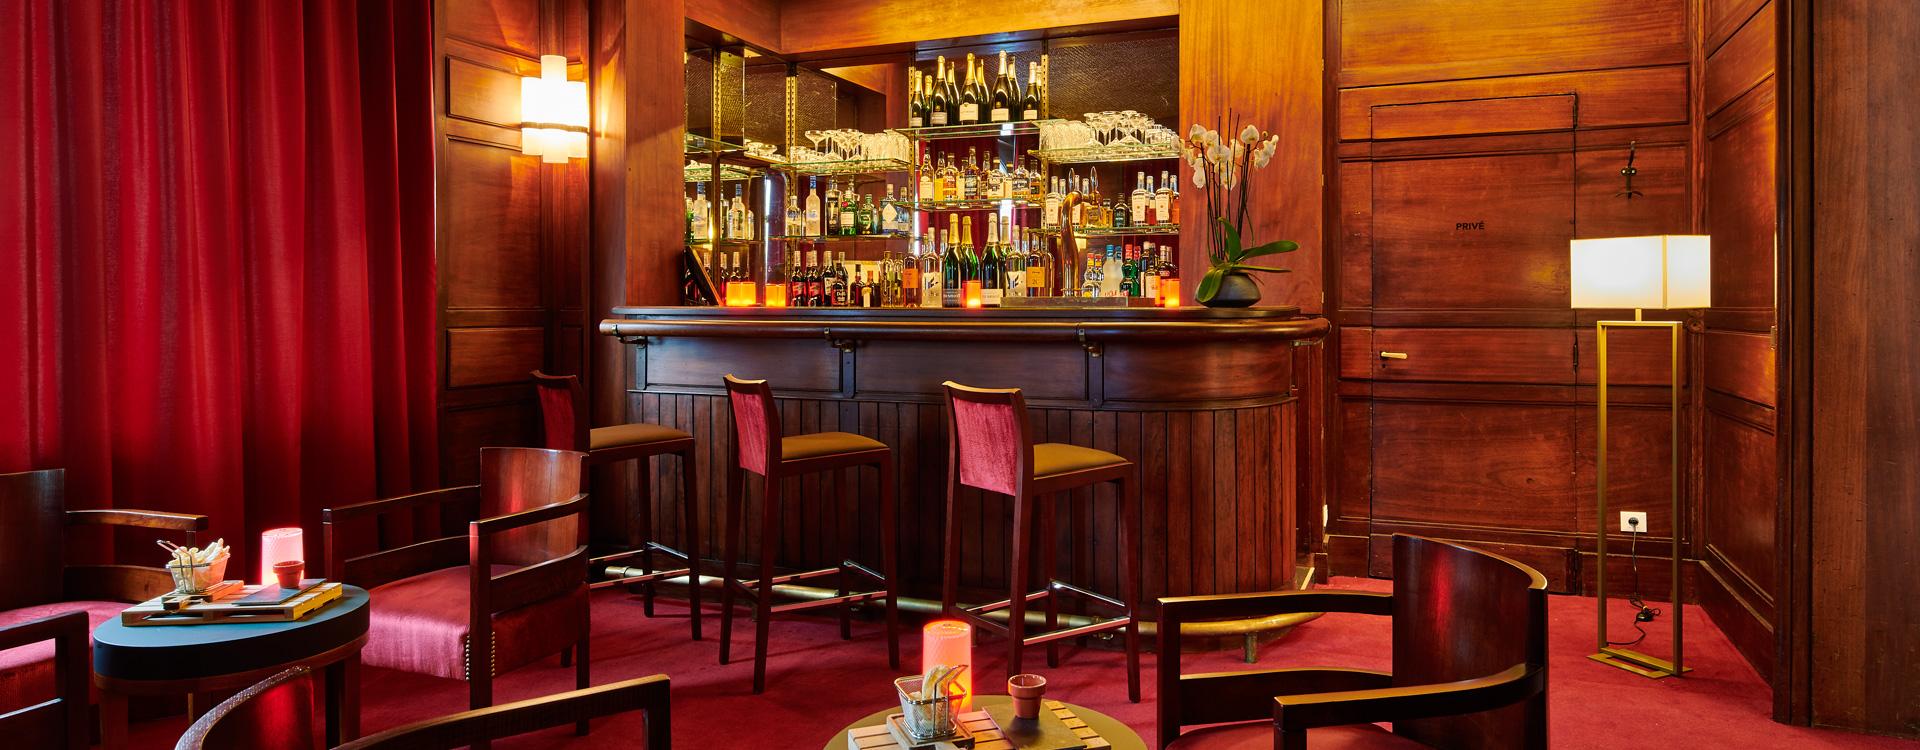 bar fumoir hotel splendid dax